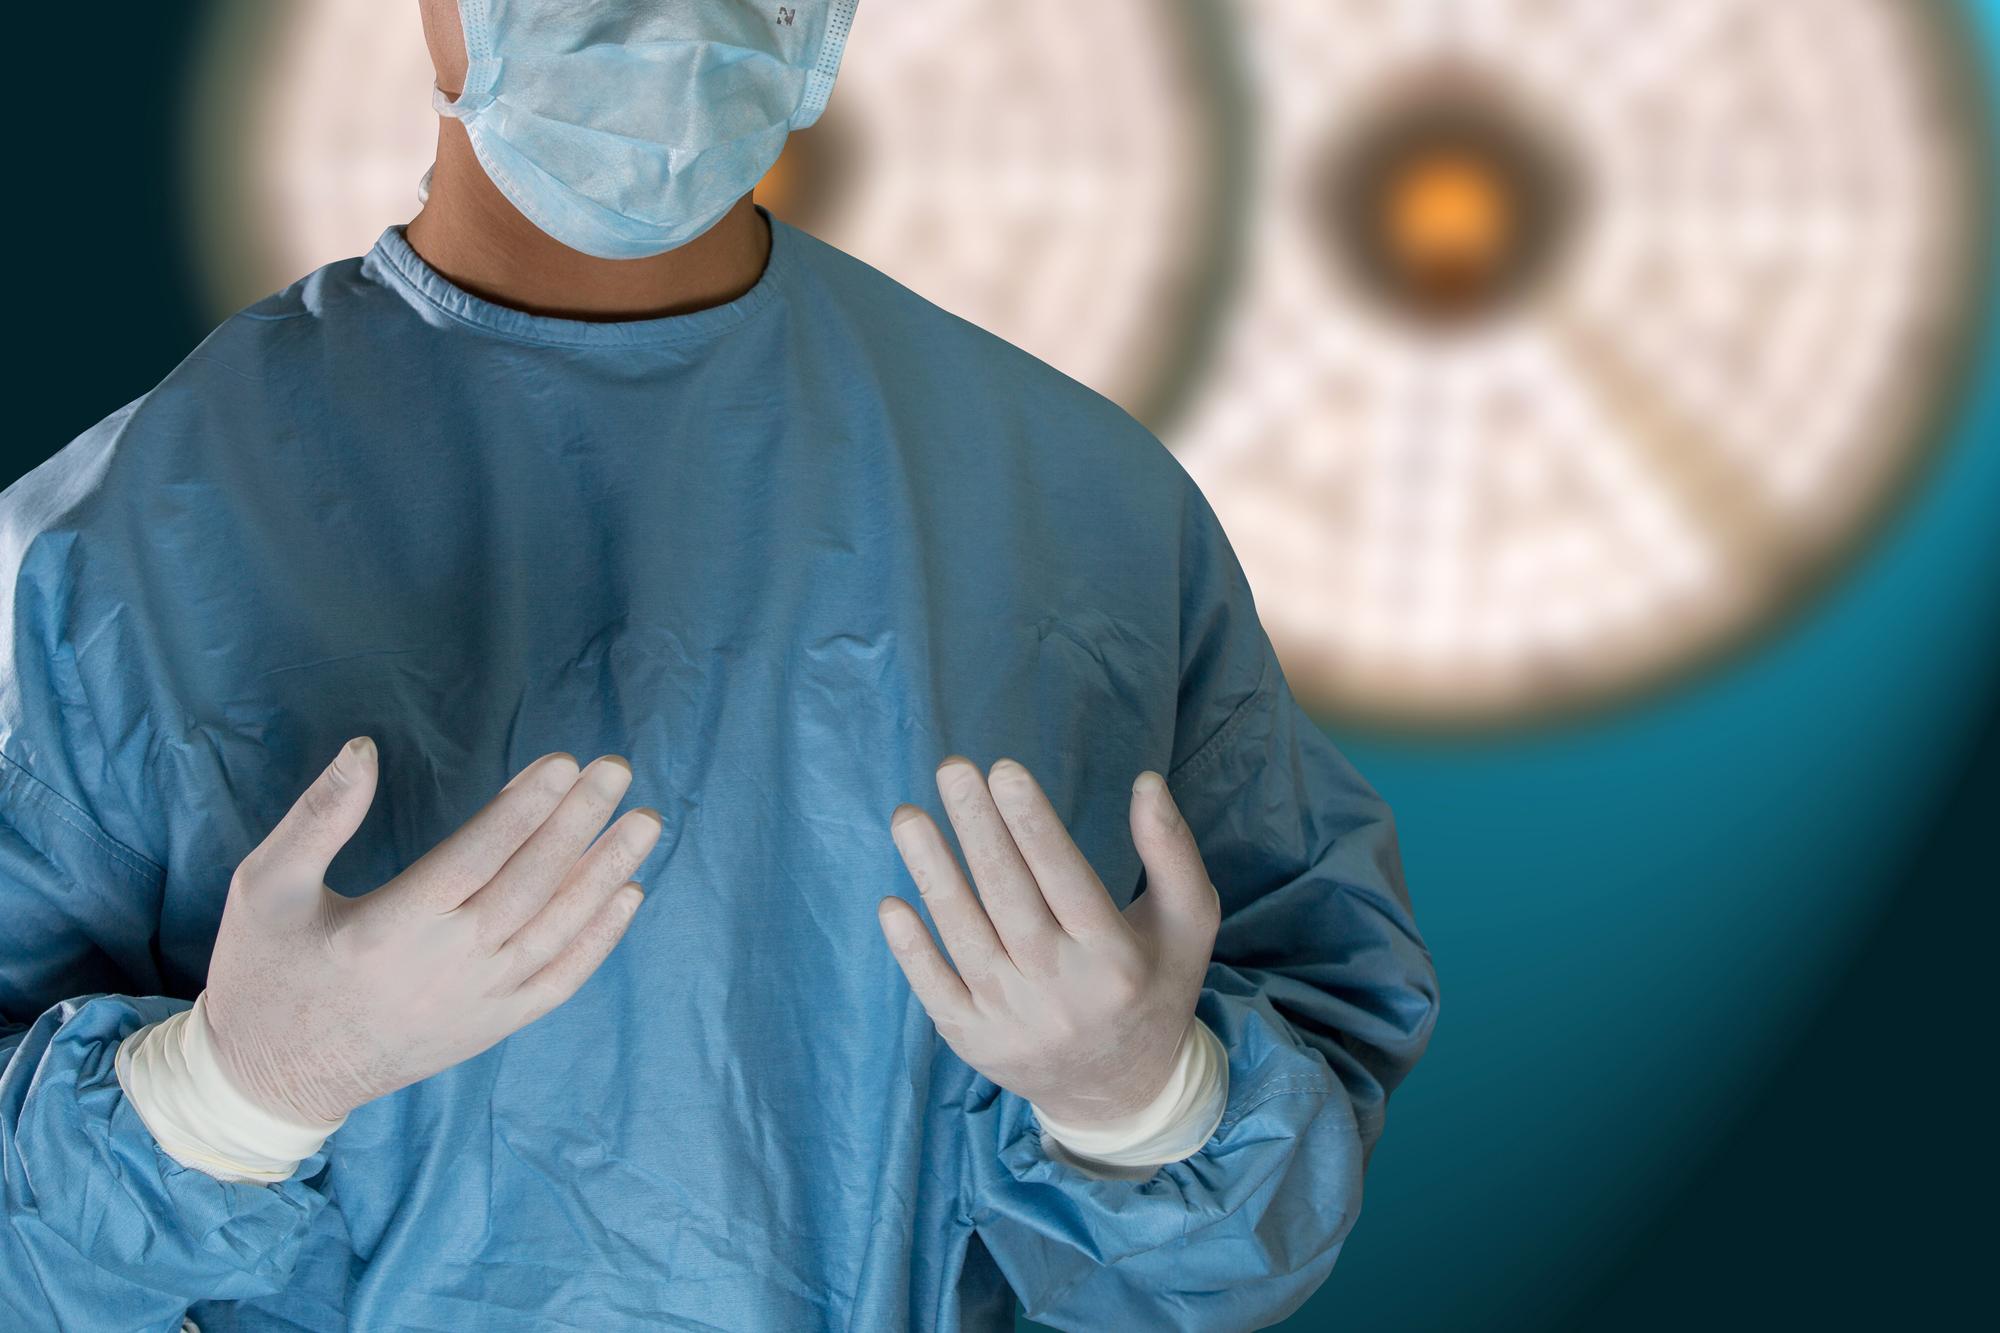 Doctor  prepare surgery equipment for help patient.